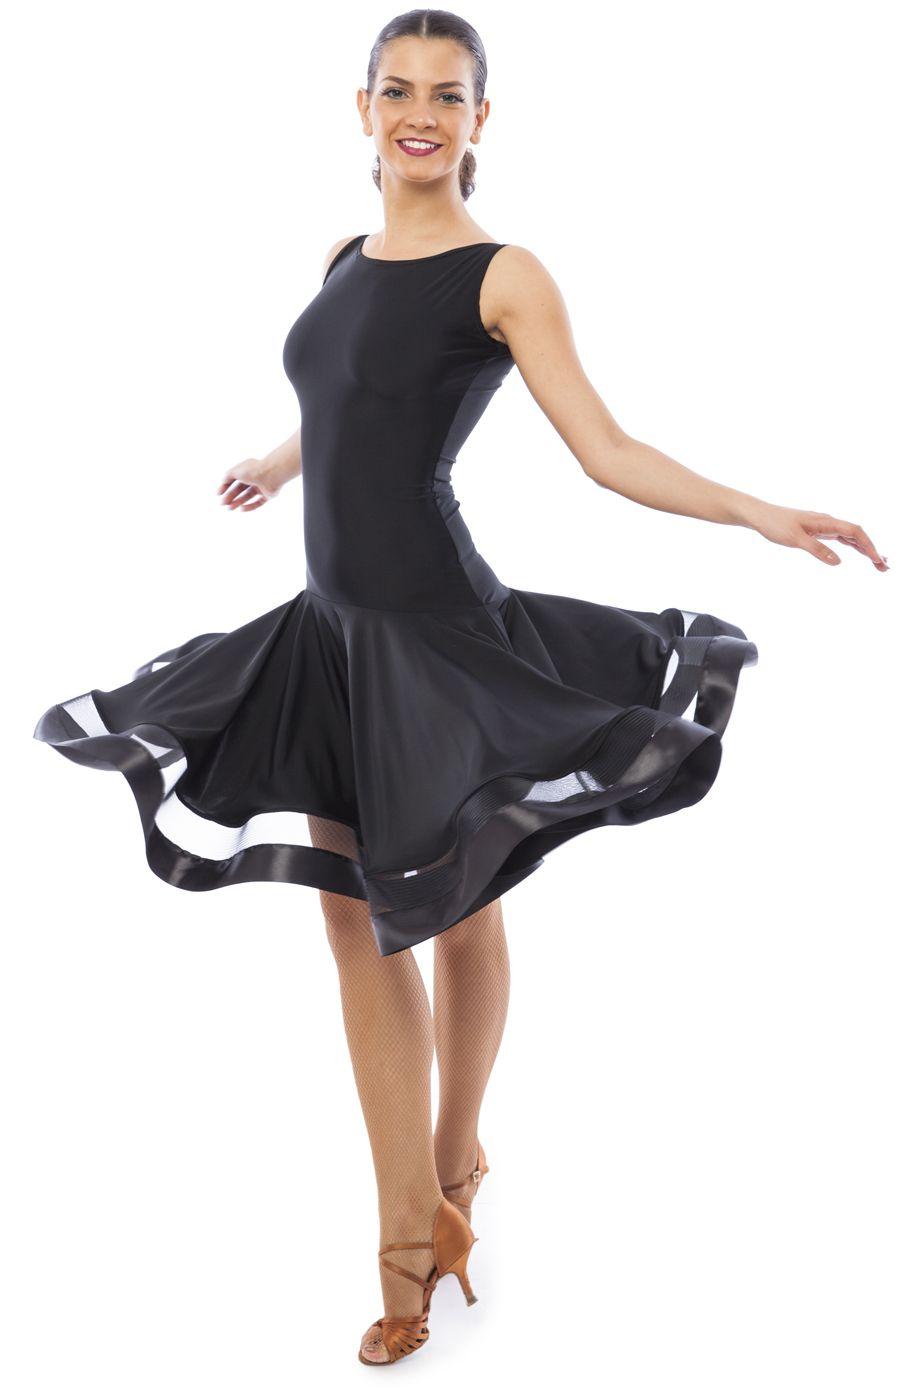 c16892904f8d7 latin practice dress Natalia | Dance in 2019 | Ballroom dance ...